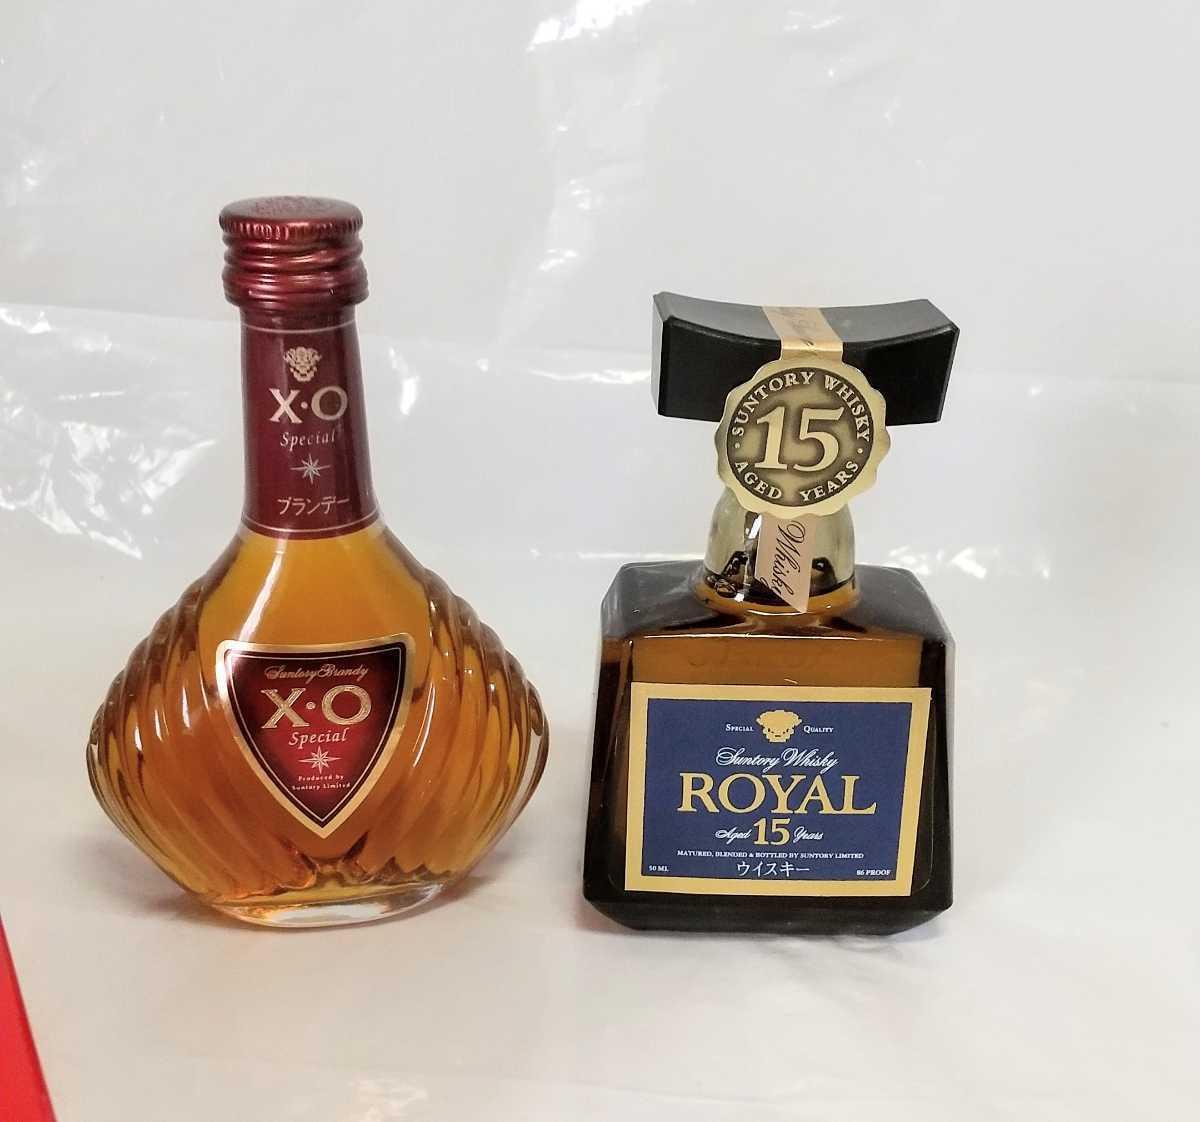 SUNTORY WHISKY ミニボトル ミニチュア グラス 付き 50ml サントリー ウイスキー ローヤル15年 royal xo _画像8